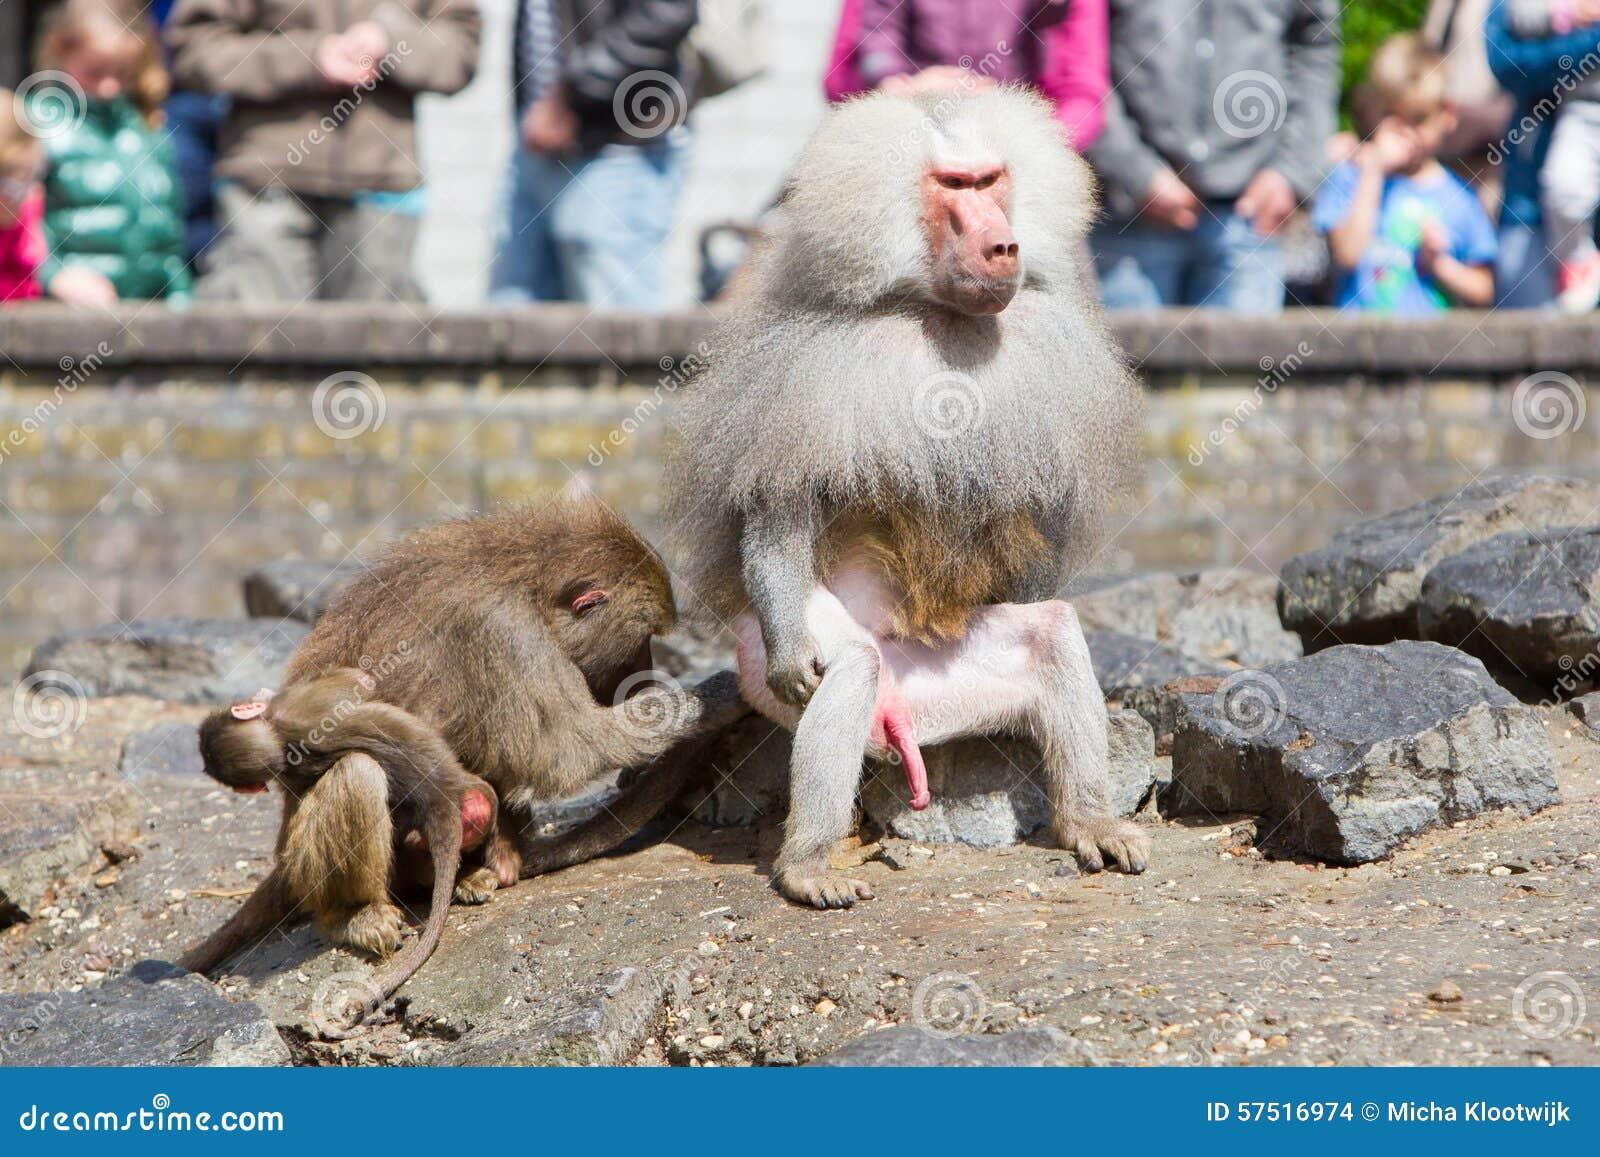 babouin femelle avec un jeune babouin photo stock image 57516974. Black Bedroom Furniture Sets. Home Design Ideas